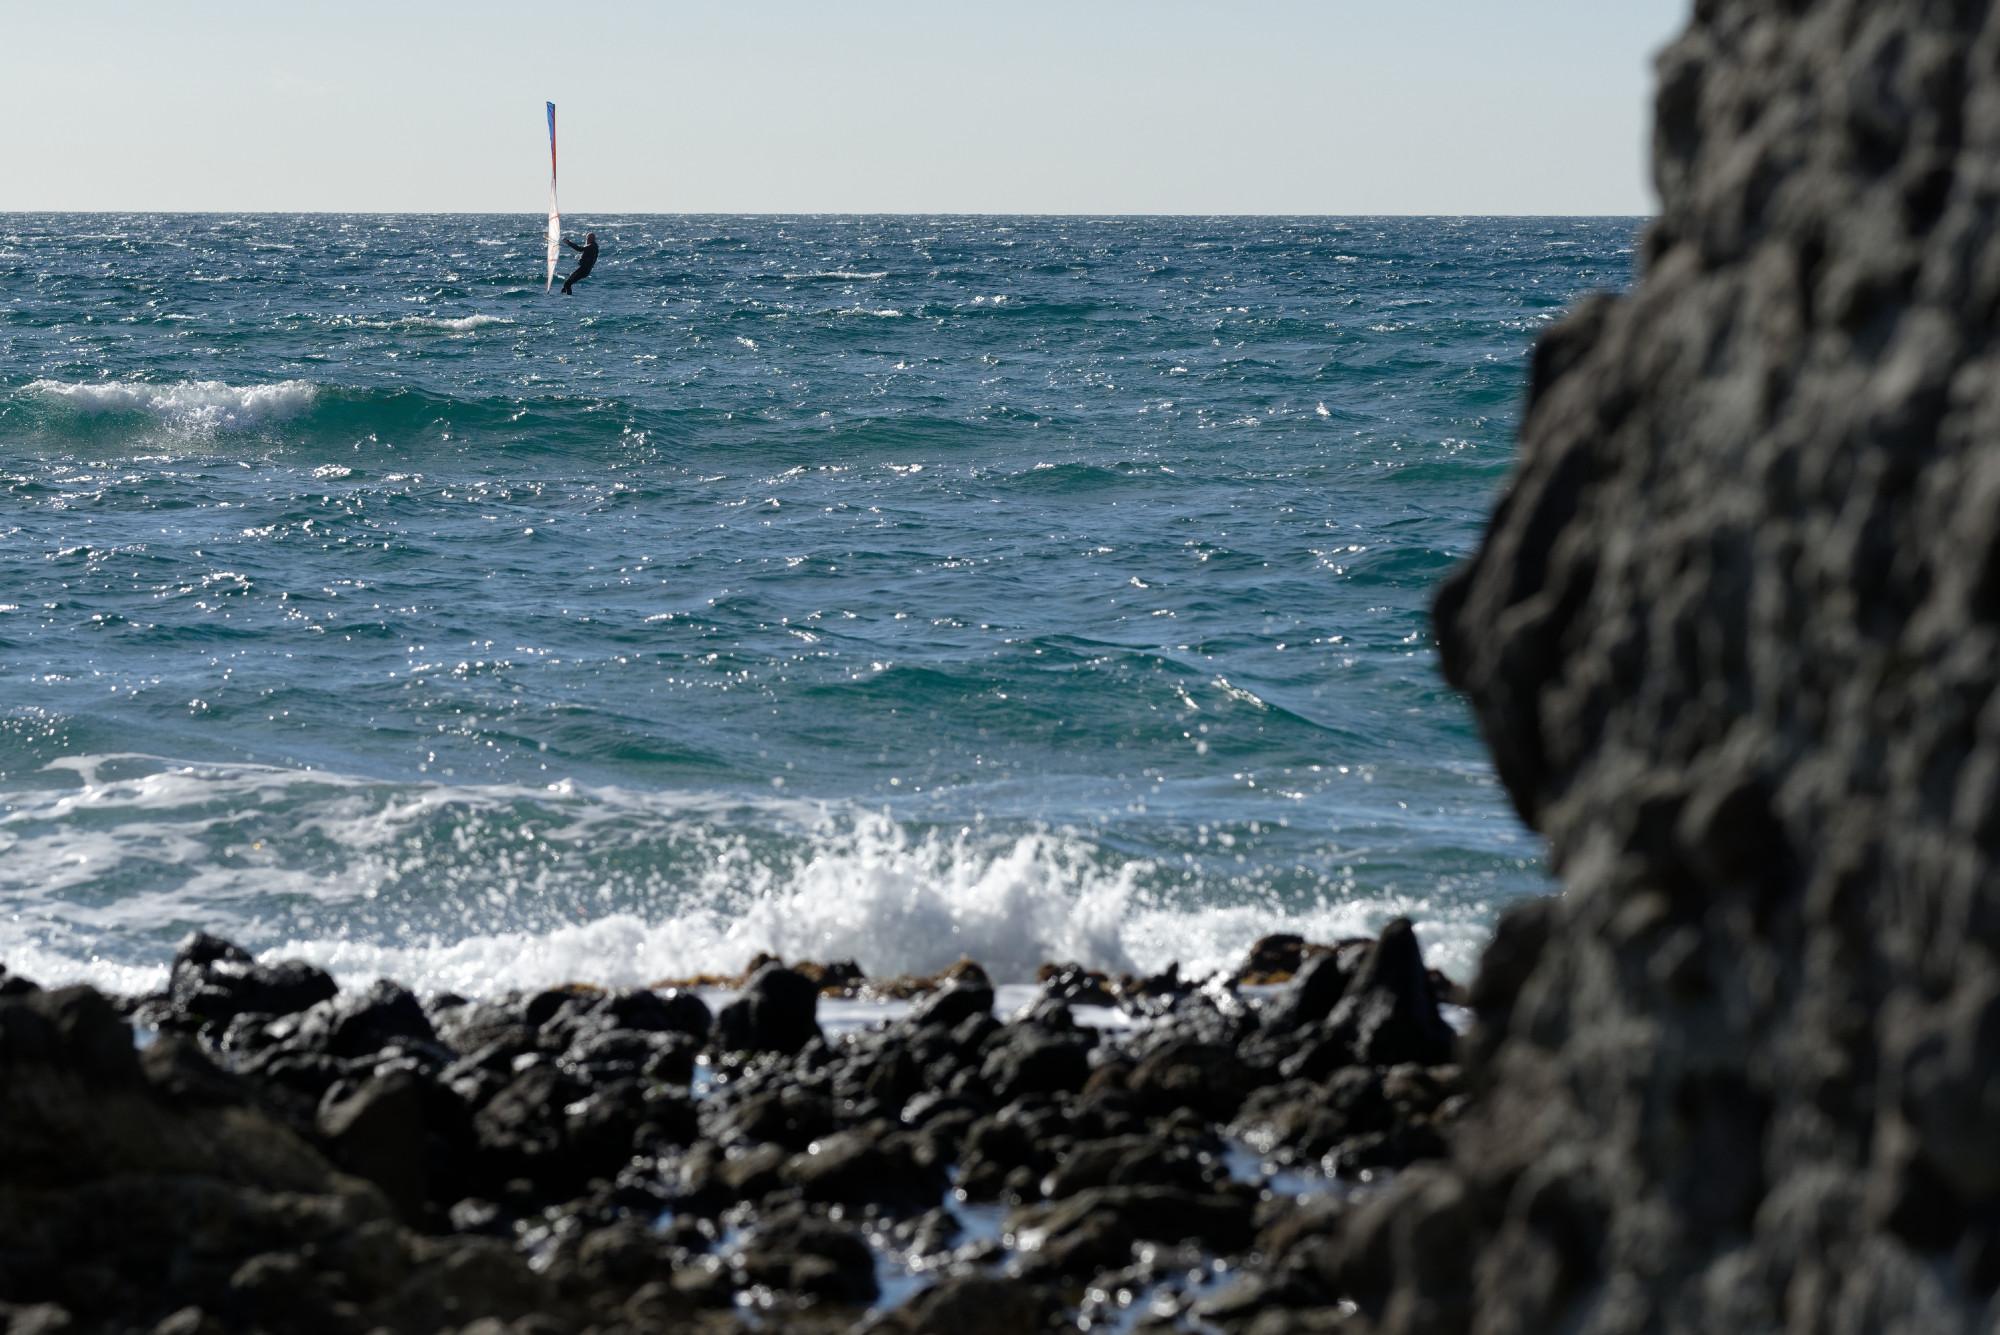 171214-San Jose-Playa del Monsul (Cabo de Gata-Andalousie) (166)